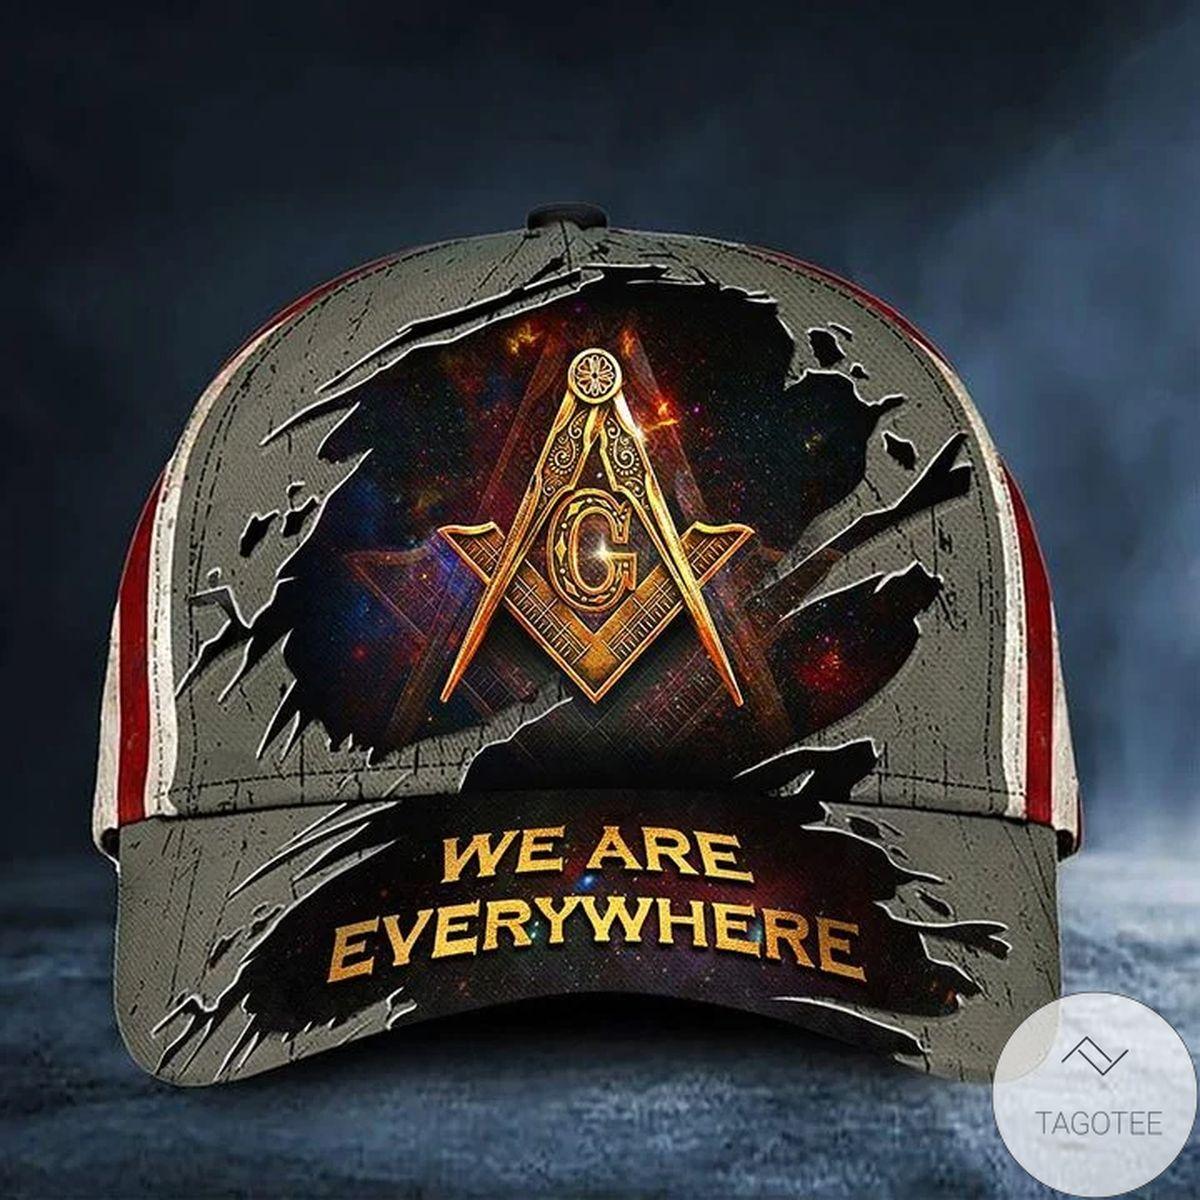 Great Quality Freemason Hat We're Everywhere USA Flag Masonic Hat Merch Unique Design Masonic Gift Ideas